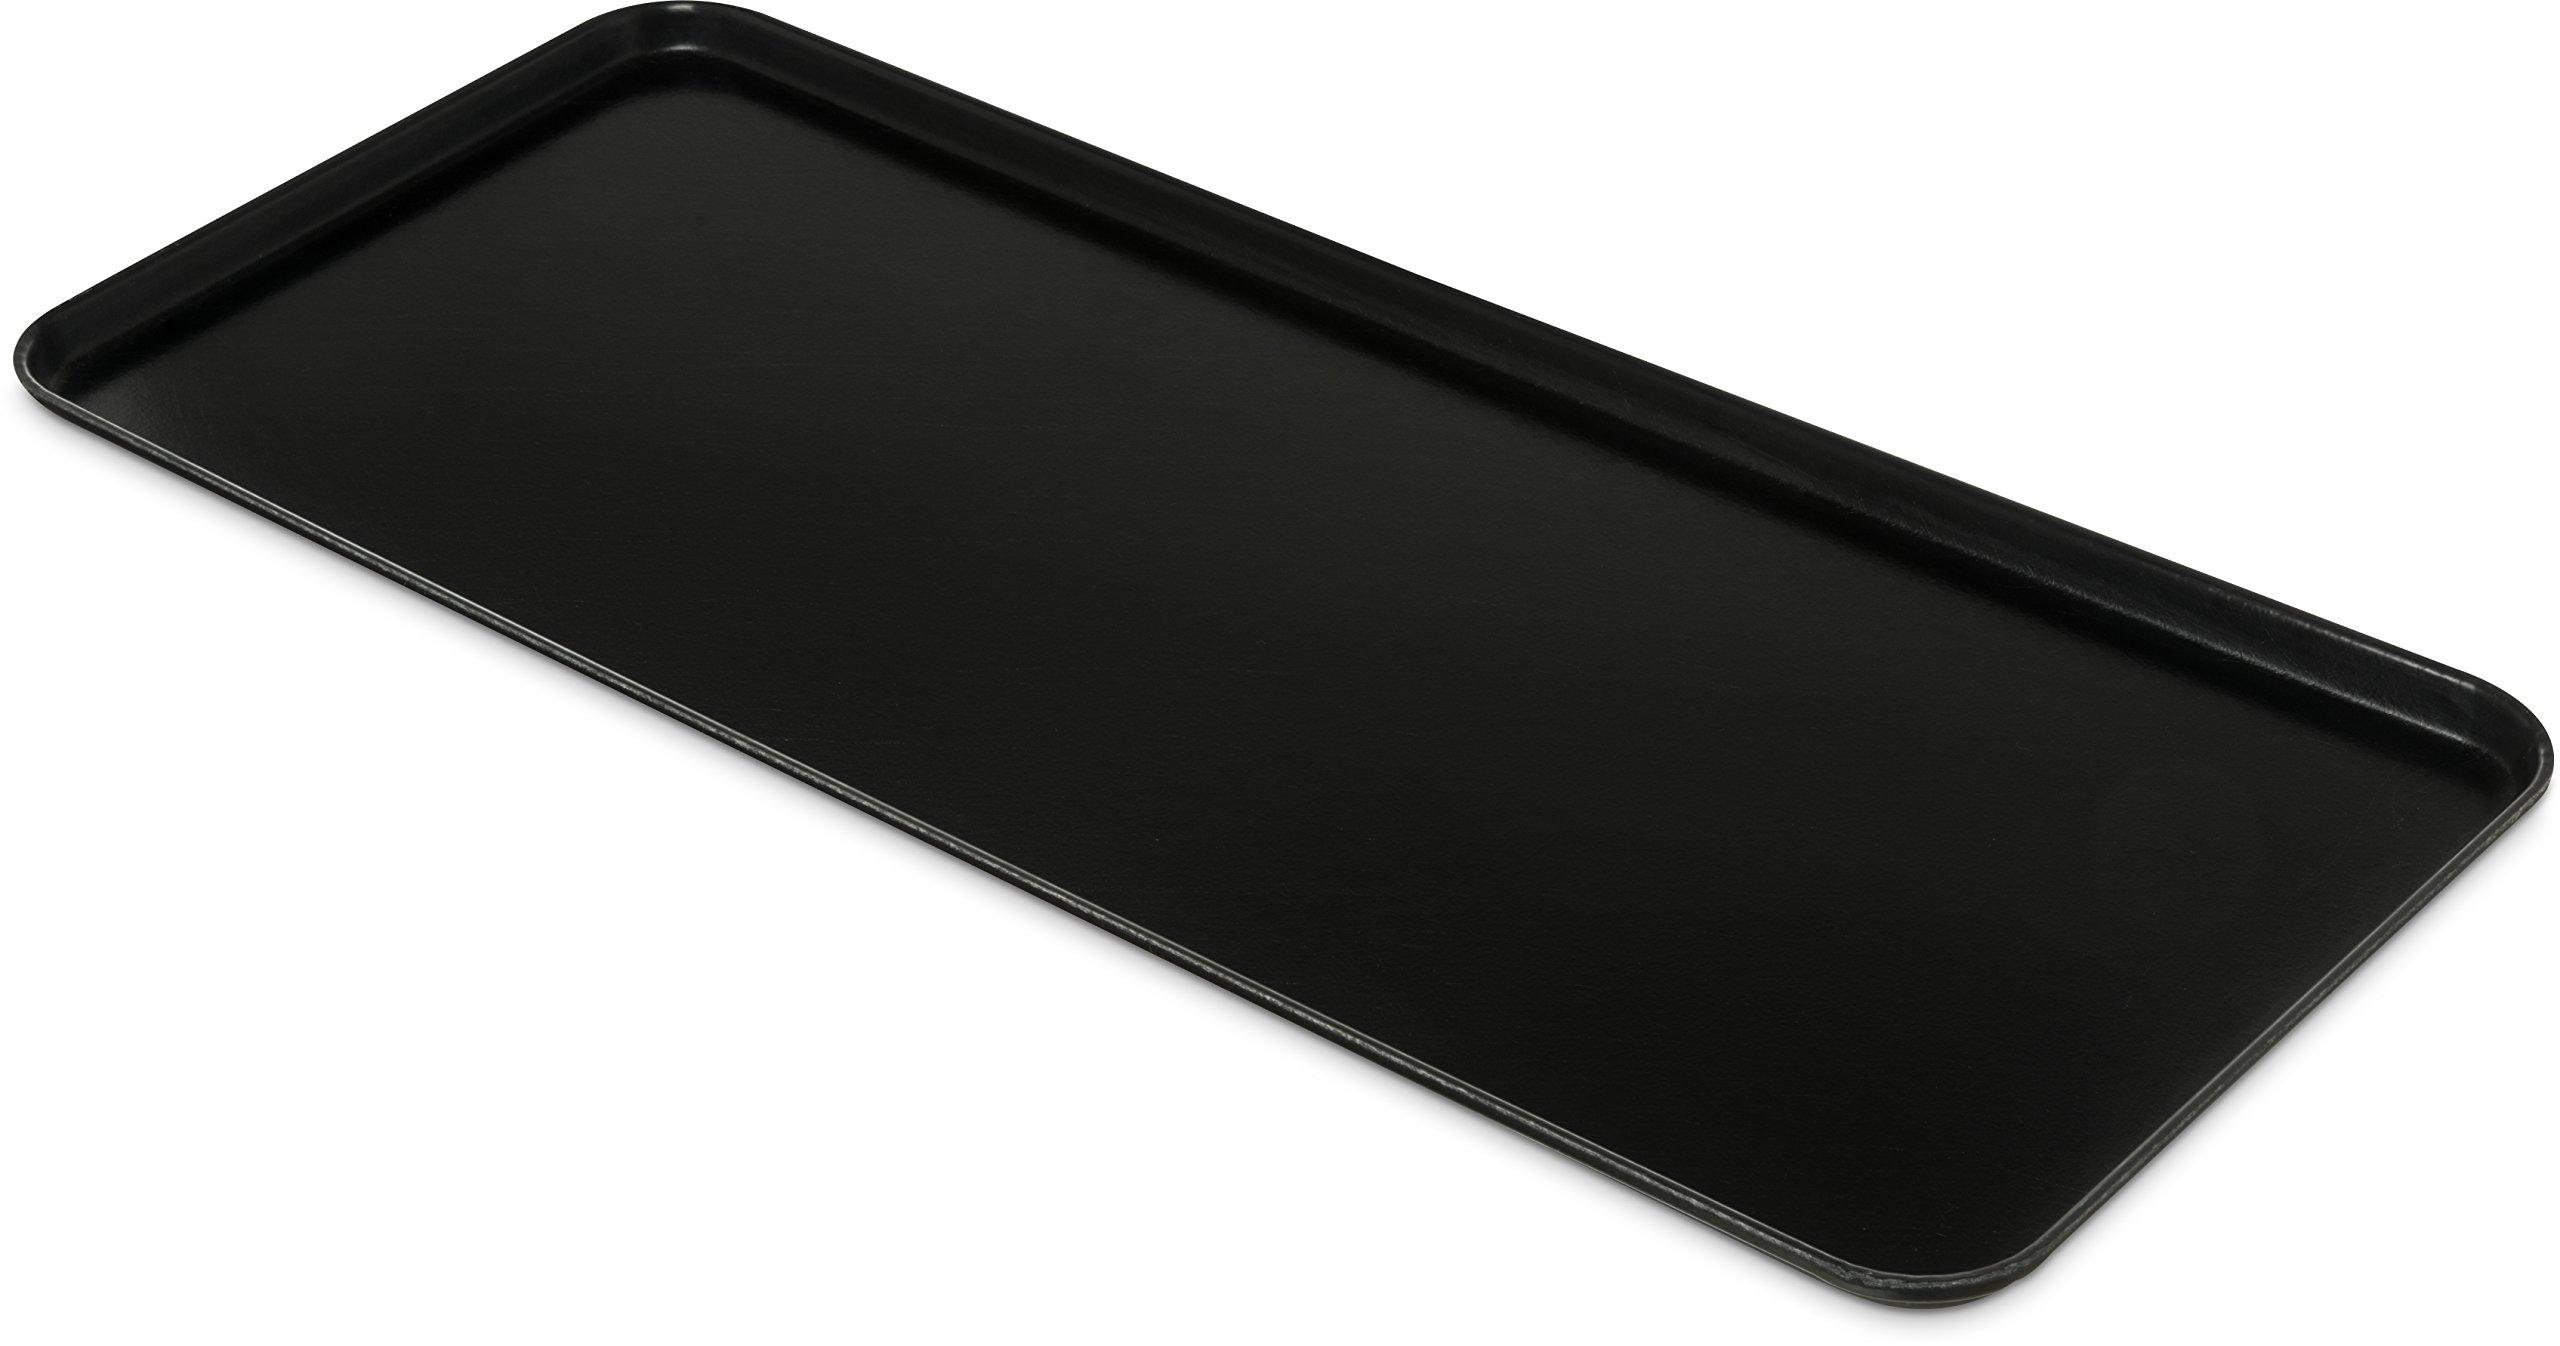 Carlisle 1230FMT309 Food Service Display Tray, 30'' x 12'', Black (Pack of 12)